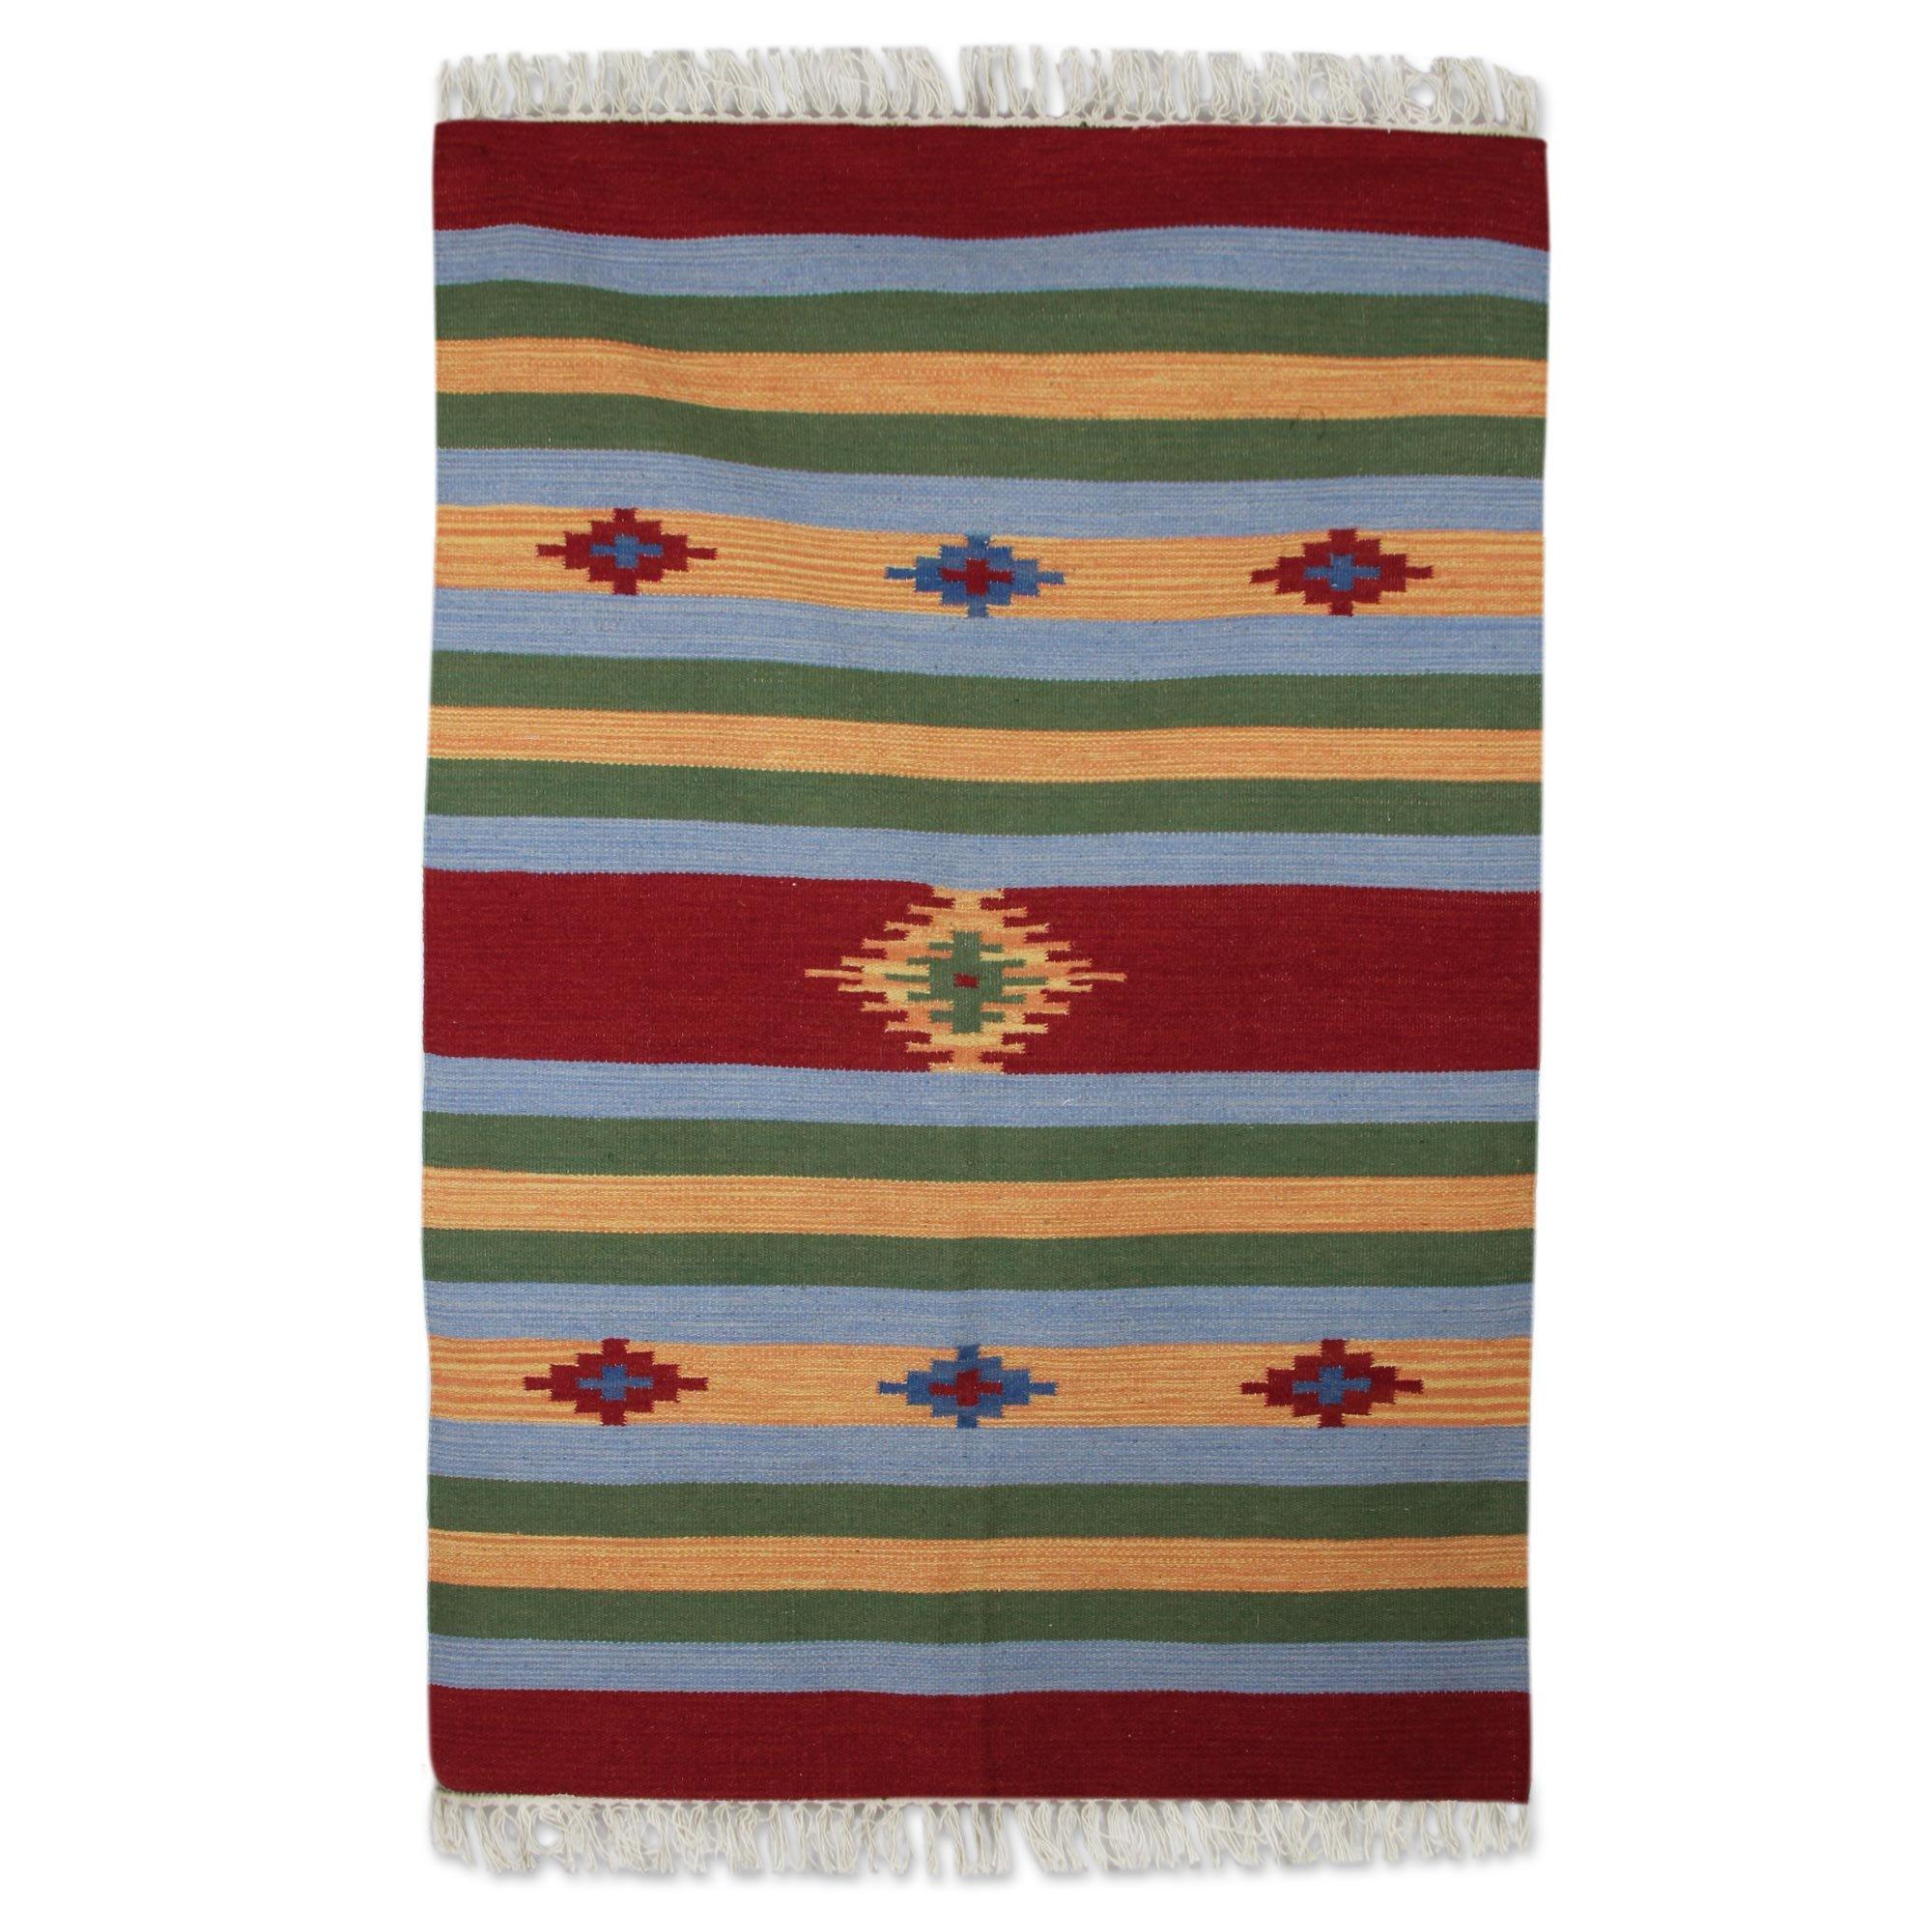 NOVICA Multicolor Wool Hand Woven Area Rug (4x6), 'Festival Of Stars'